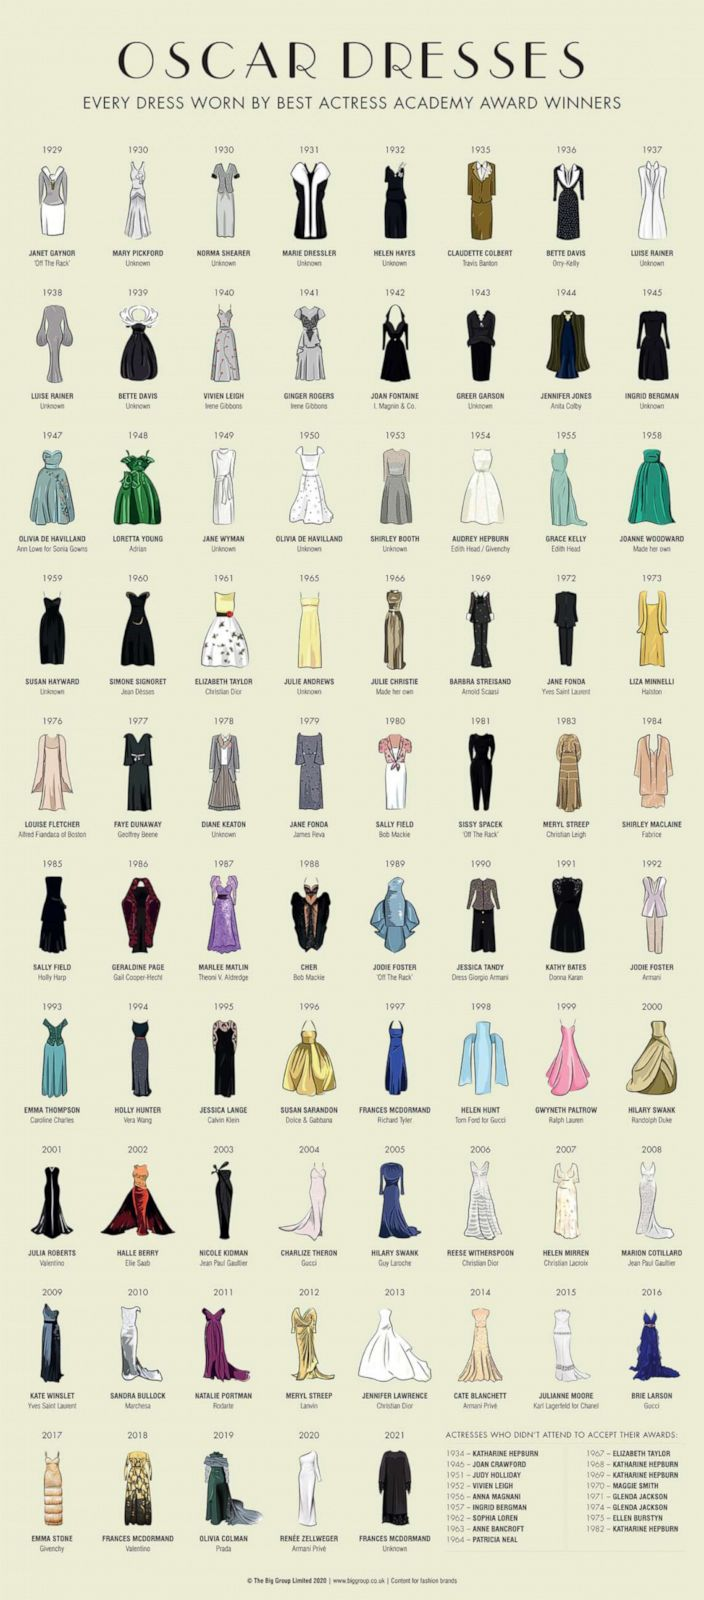 dresses-oscars-ht-rc-210426_161945736265